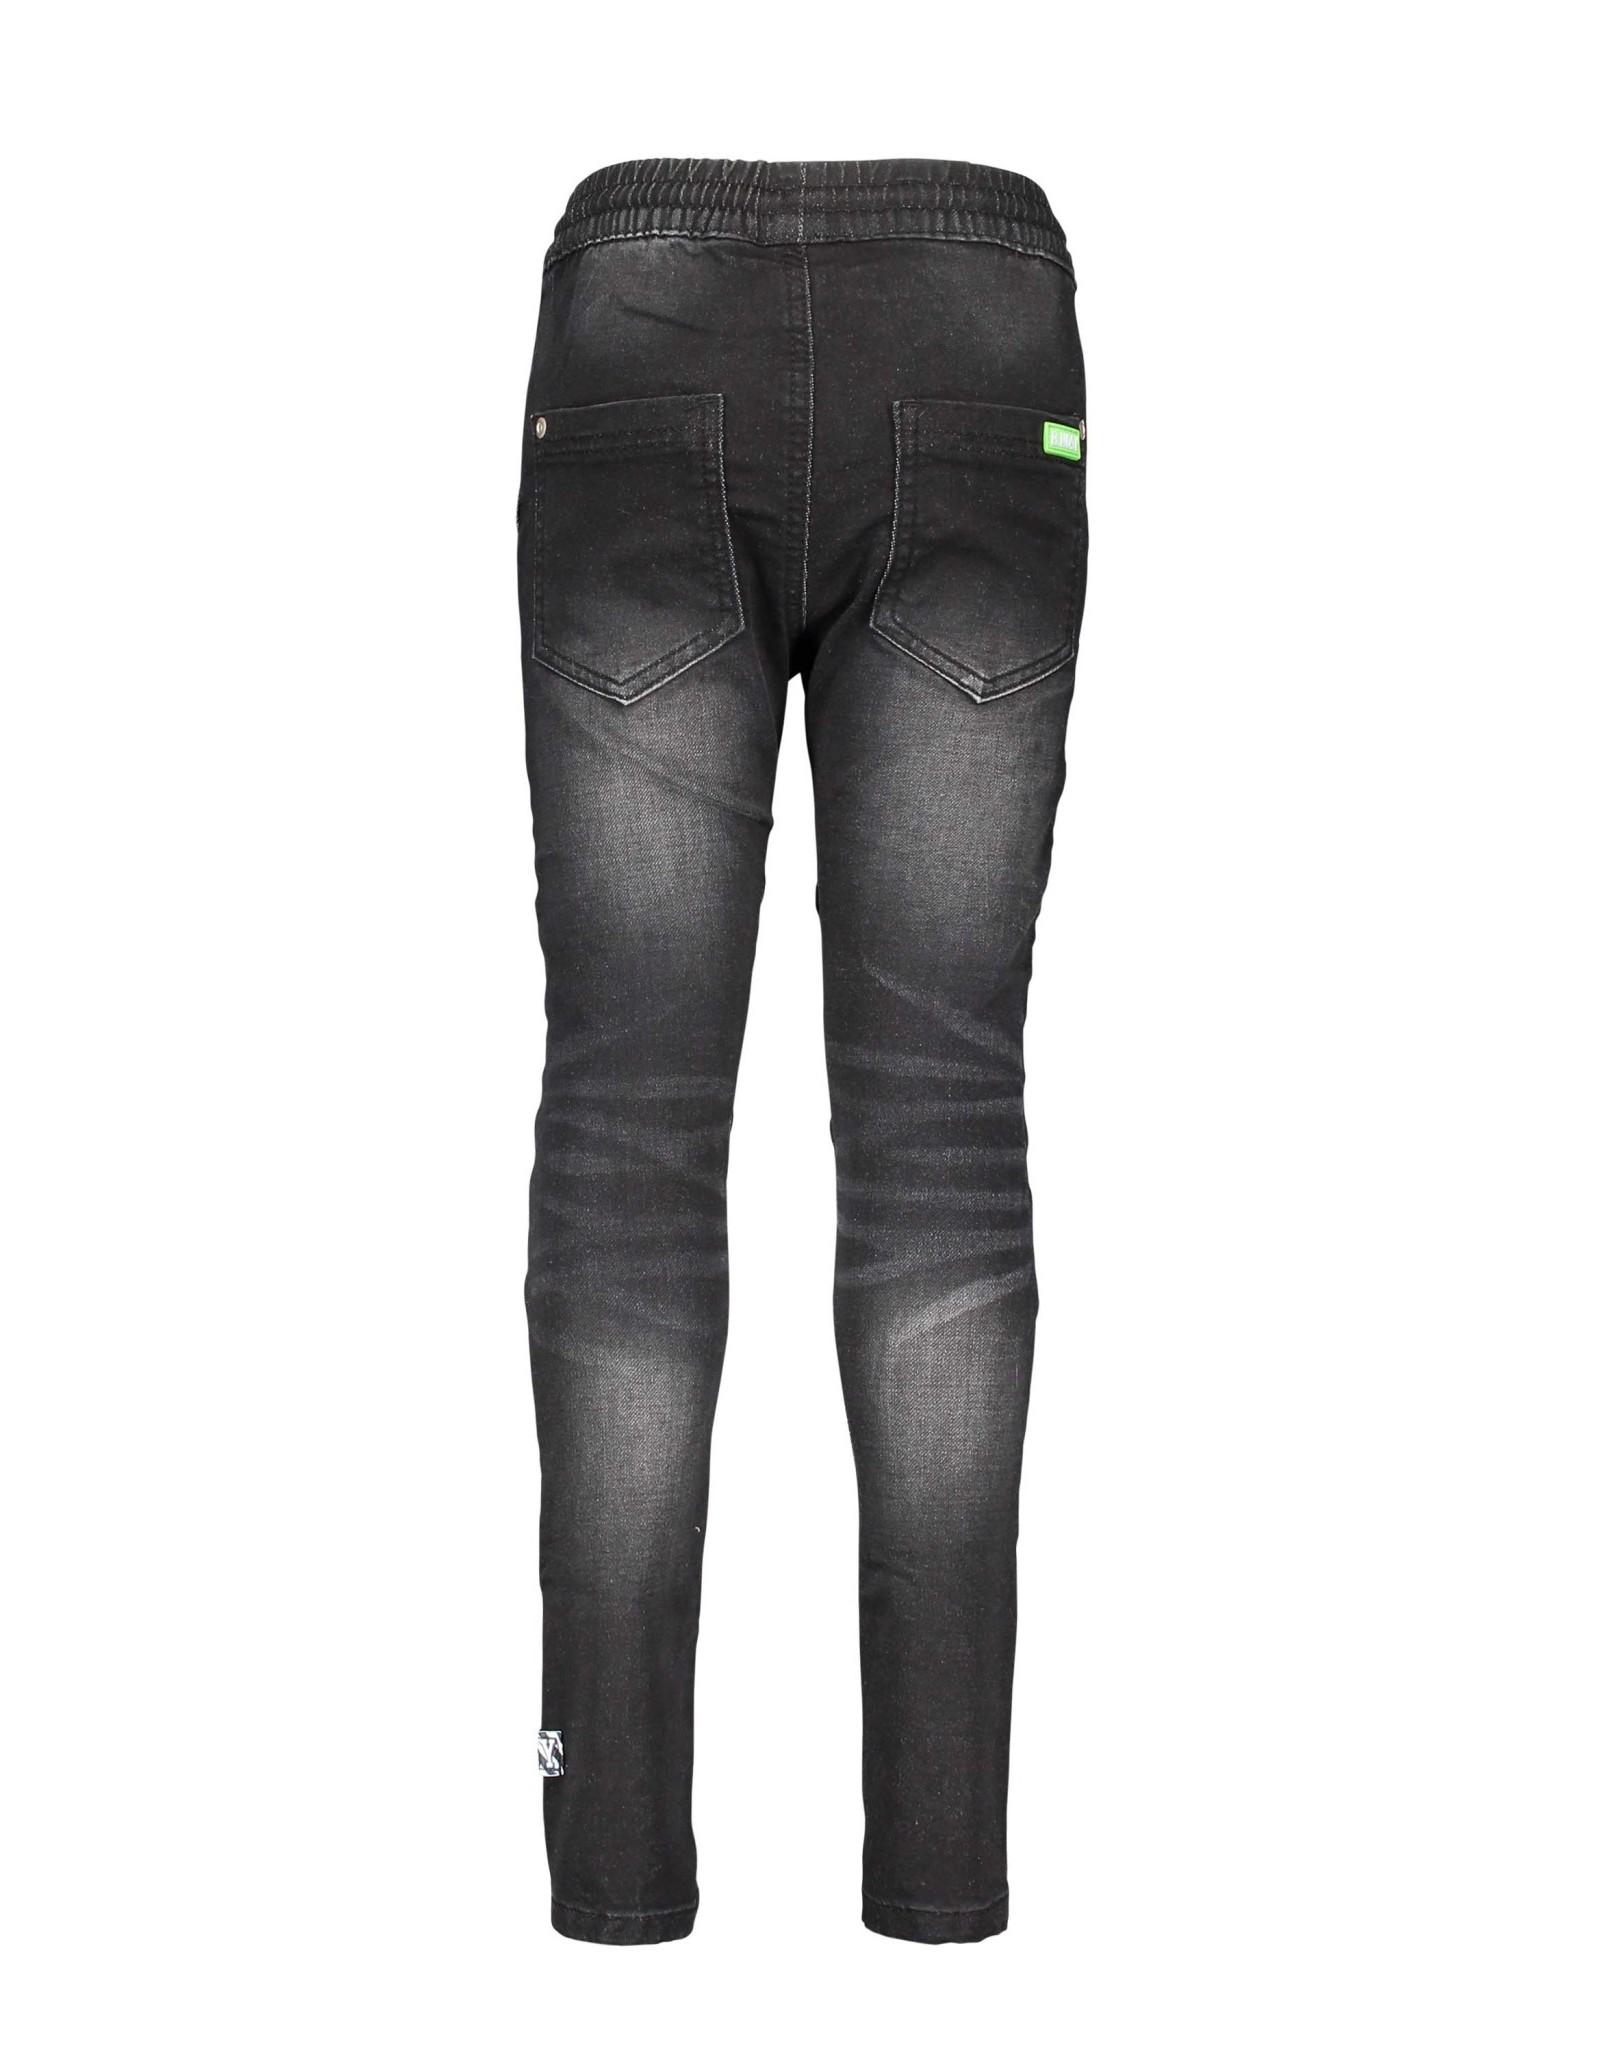 B-nosy Boys jog denim pants with smocked wb Black denim